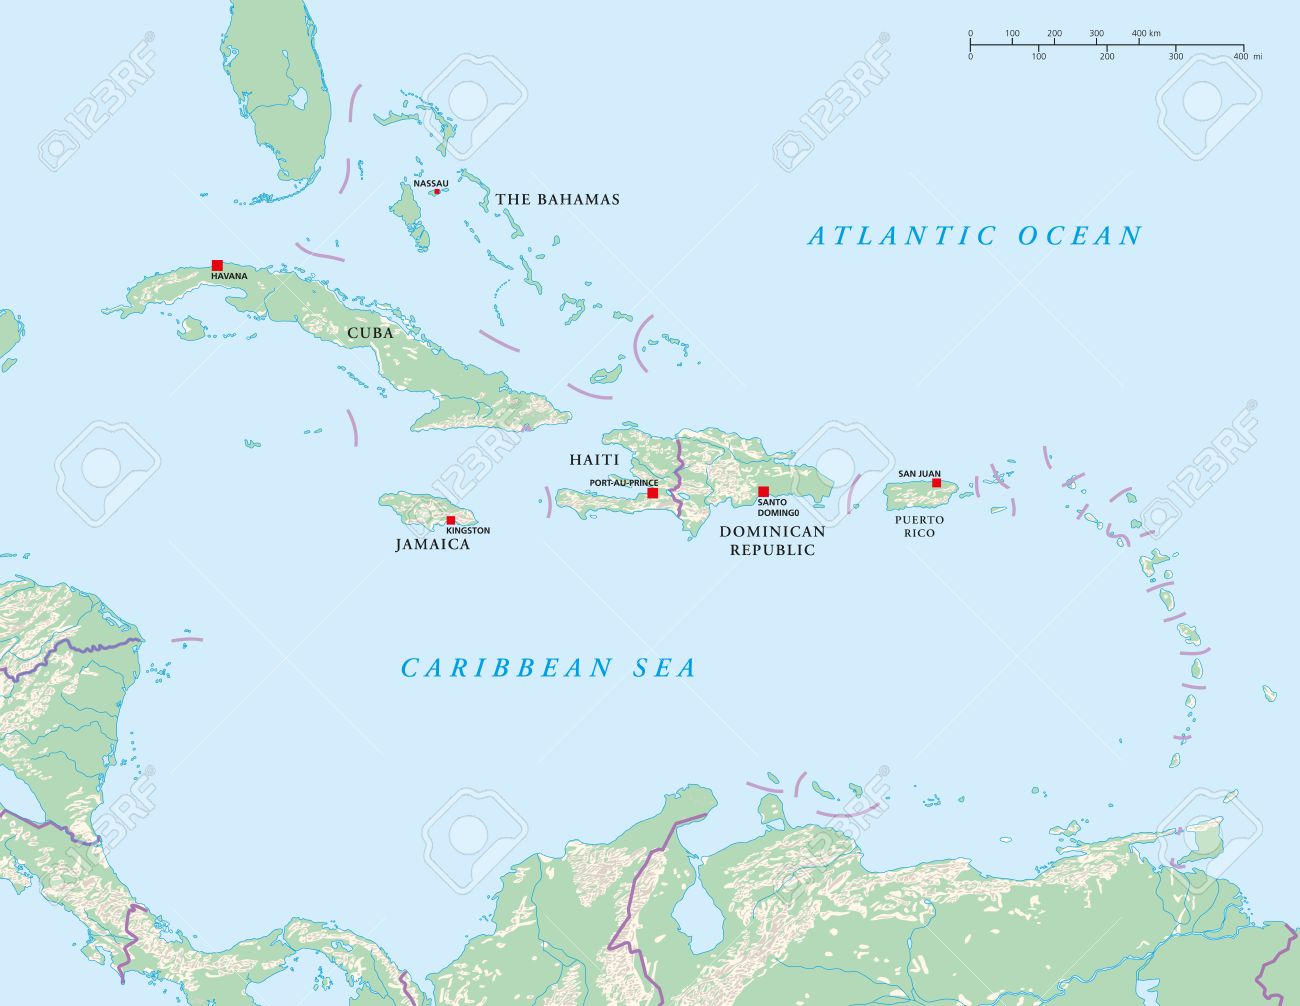 Caribbean Islands Political Map on south america map, tanzania map, caribbean island cruise, puerto rico map, panama map, san juan islands map, bahrain map, caribbean island names, cayman island map, jamaica map, netherlands map, isle of man map, belgium map, bermuda map, timor leste map, iraq map, japan map, brazil map, italy map, dominican republic map, greece map, central america map, virgin islands map, georgia map,